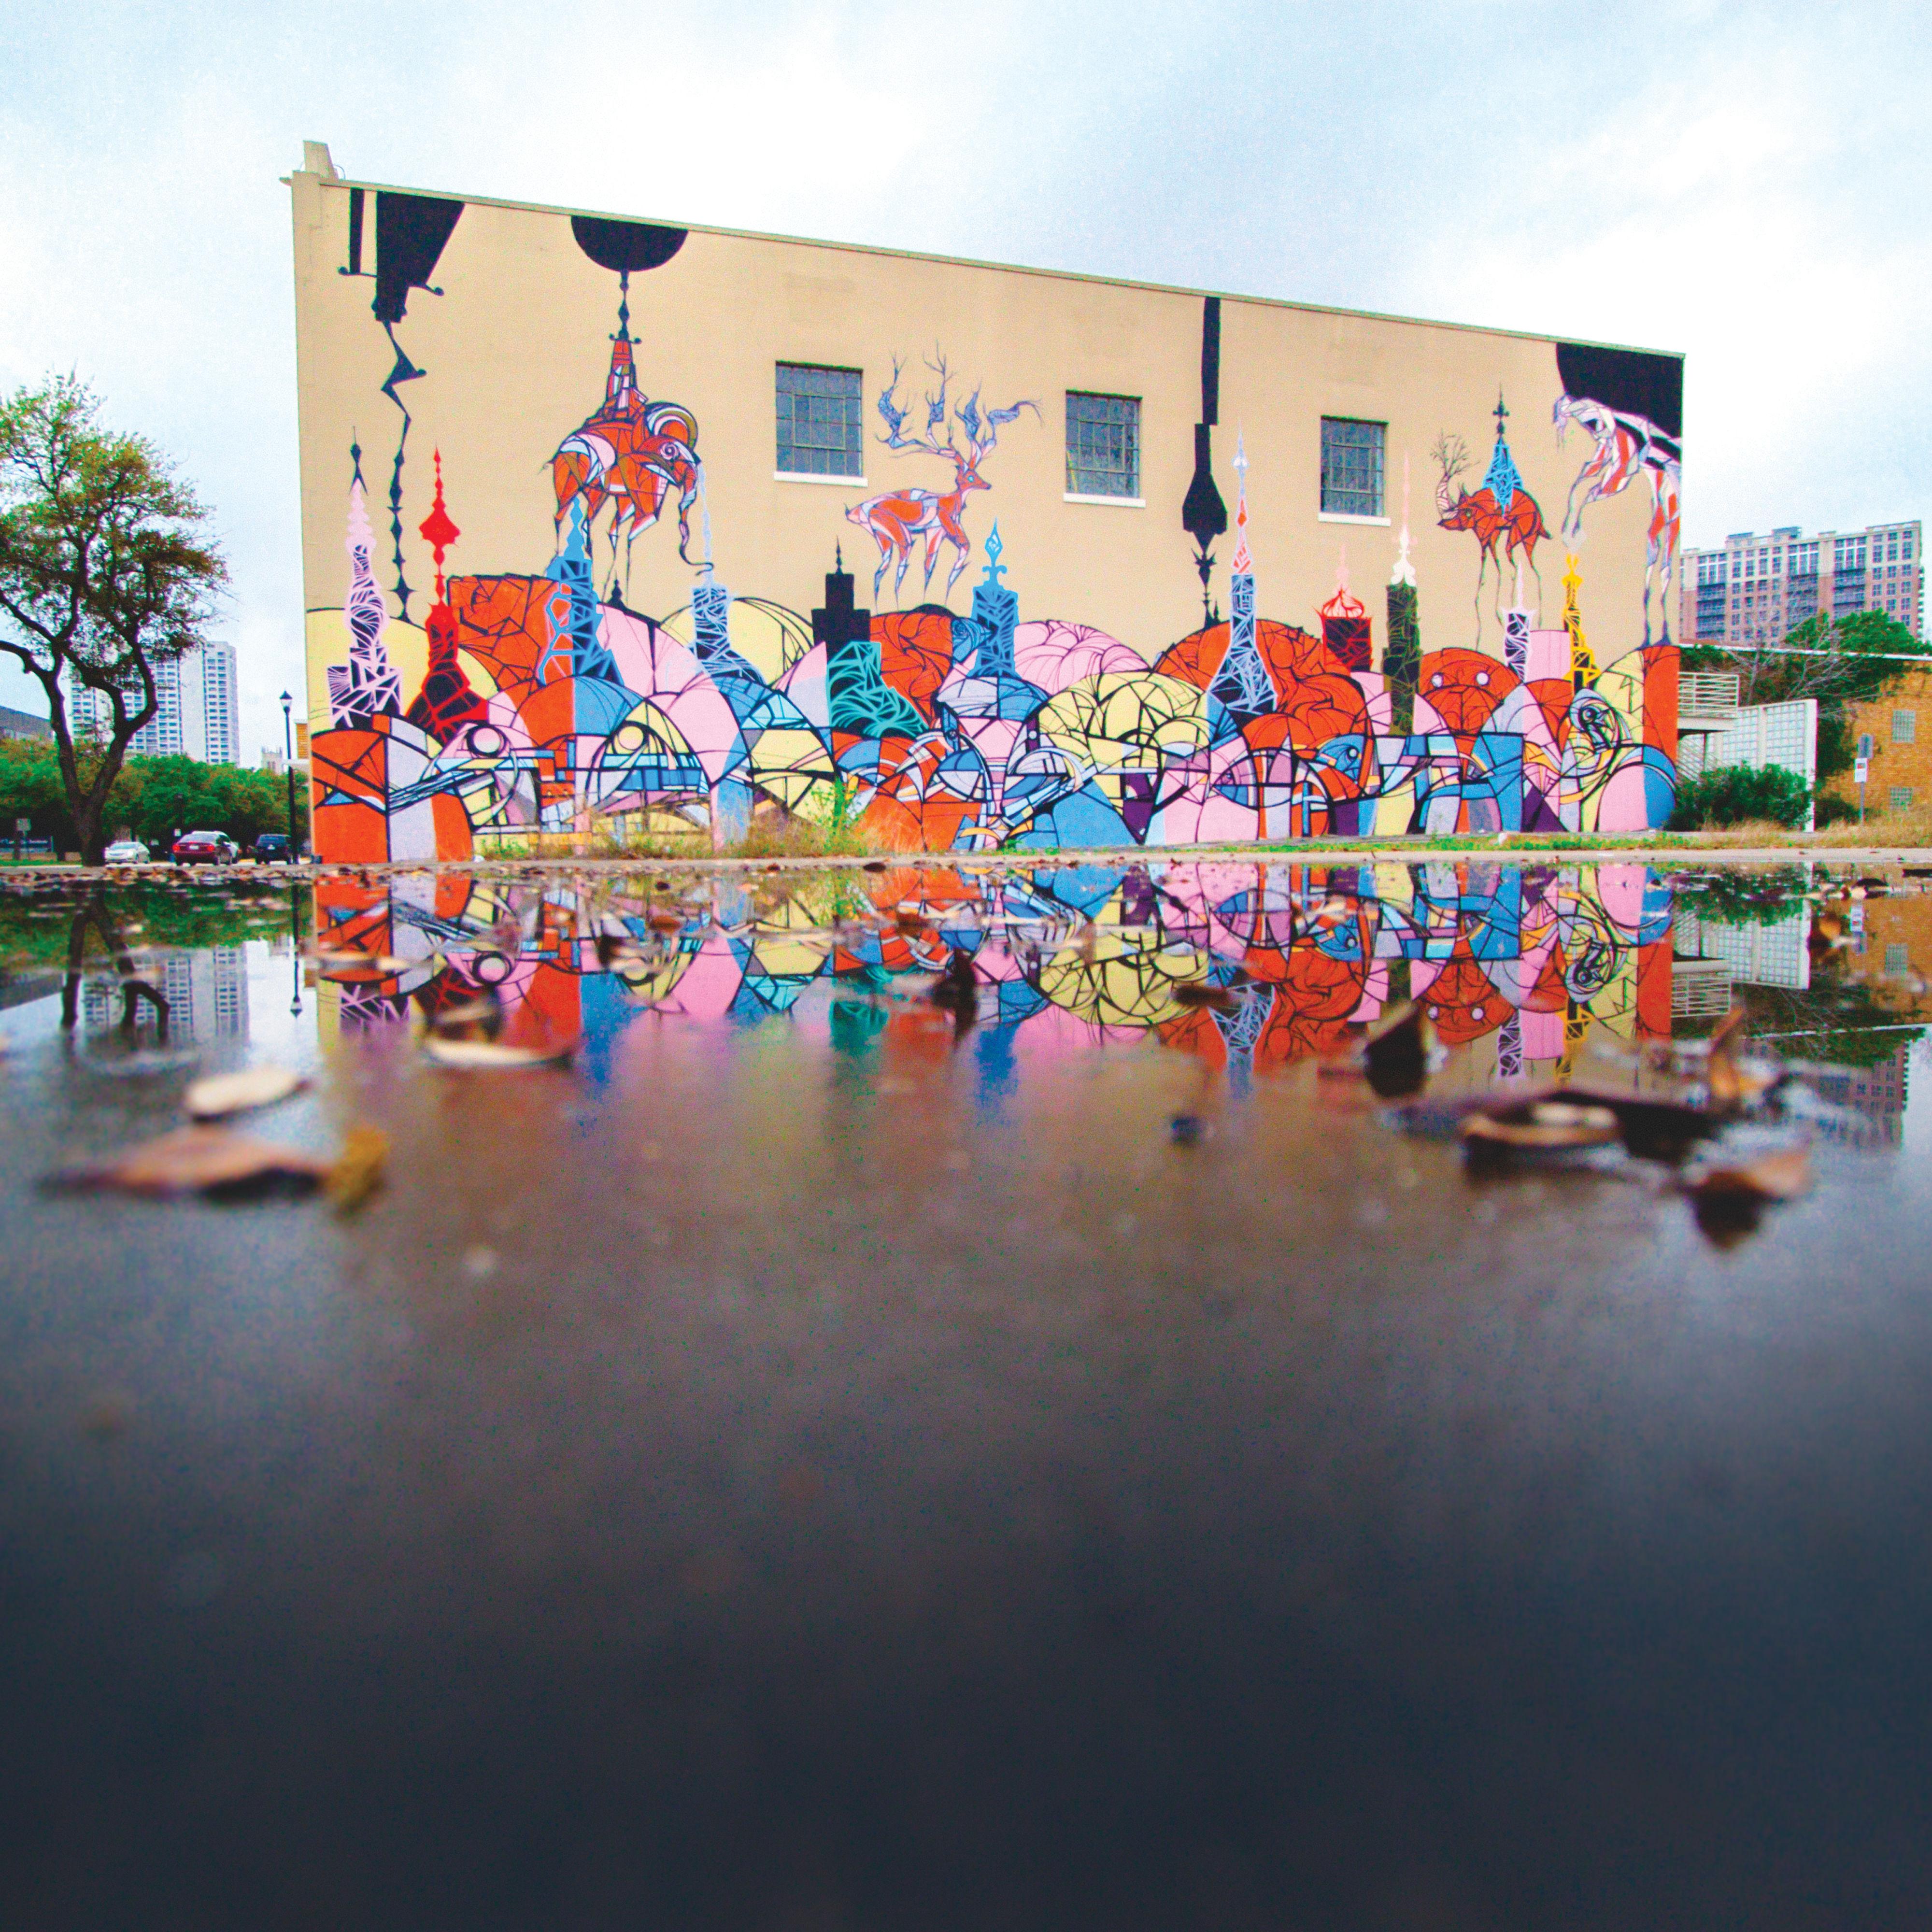 0717 street art daniel wall qvtlpe